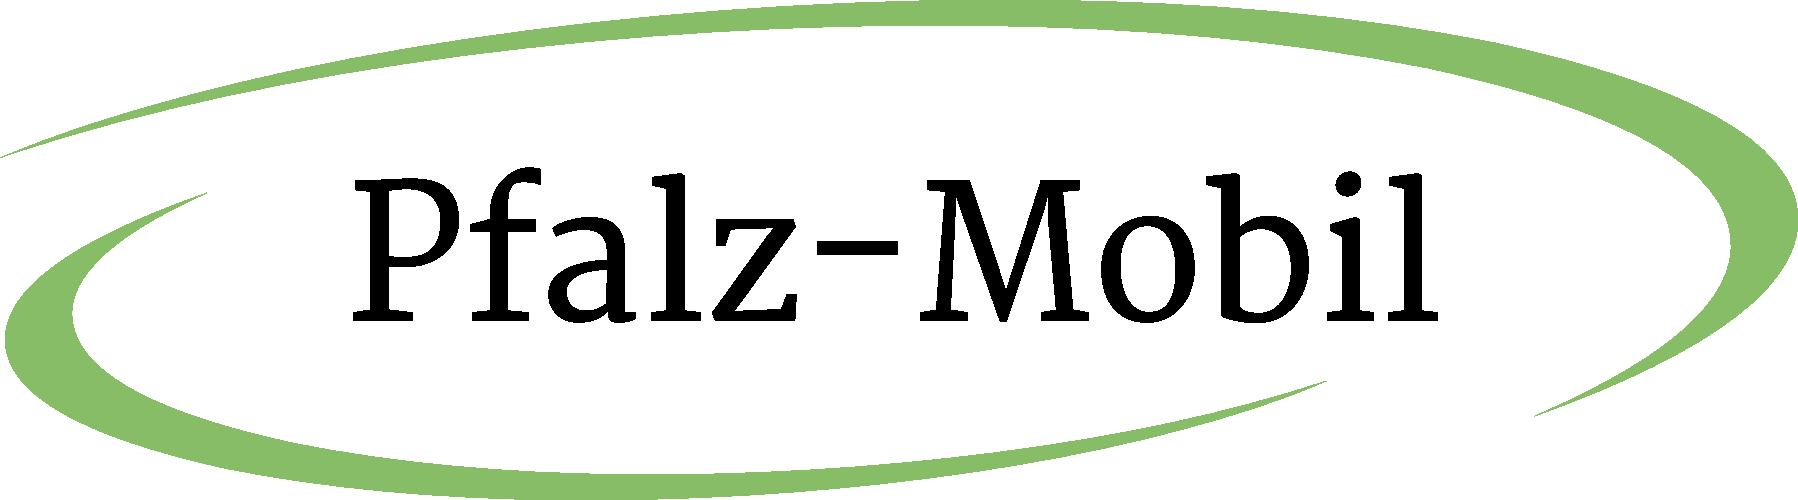 Pfalz-Mobil-Logo